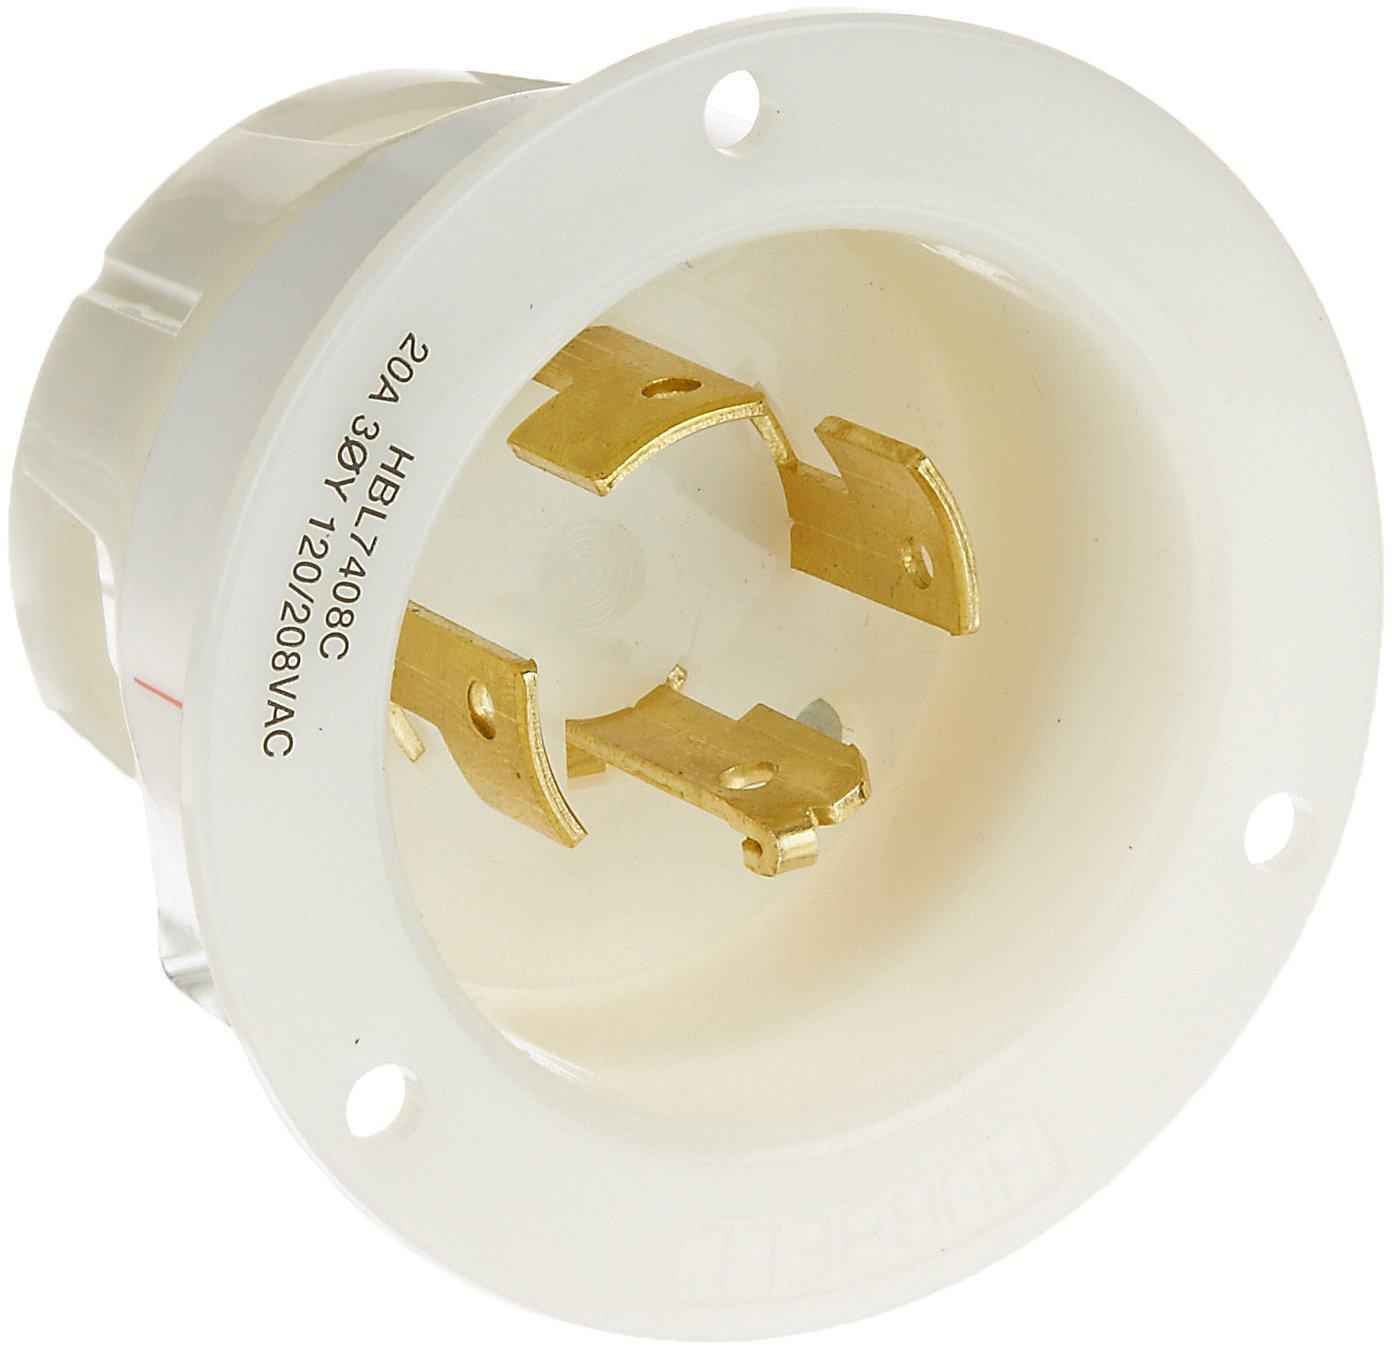 hubbell wiring systems hbl7408c wp2 insulgrip twist lock wall plate rh amazon com